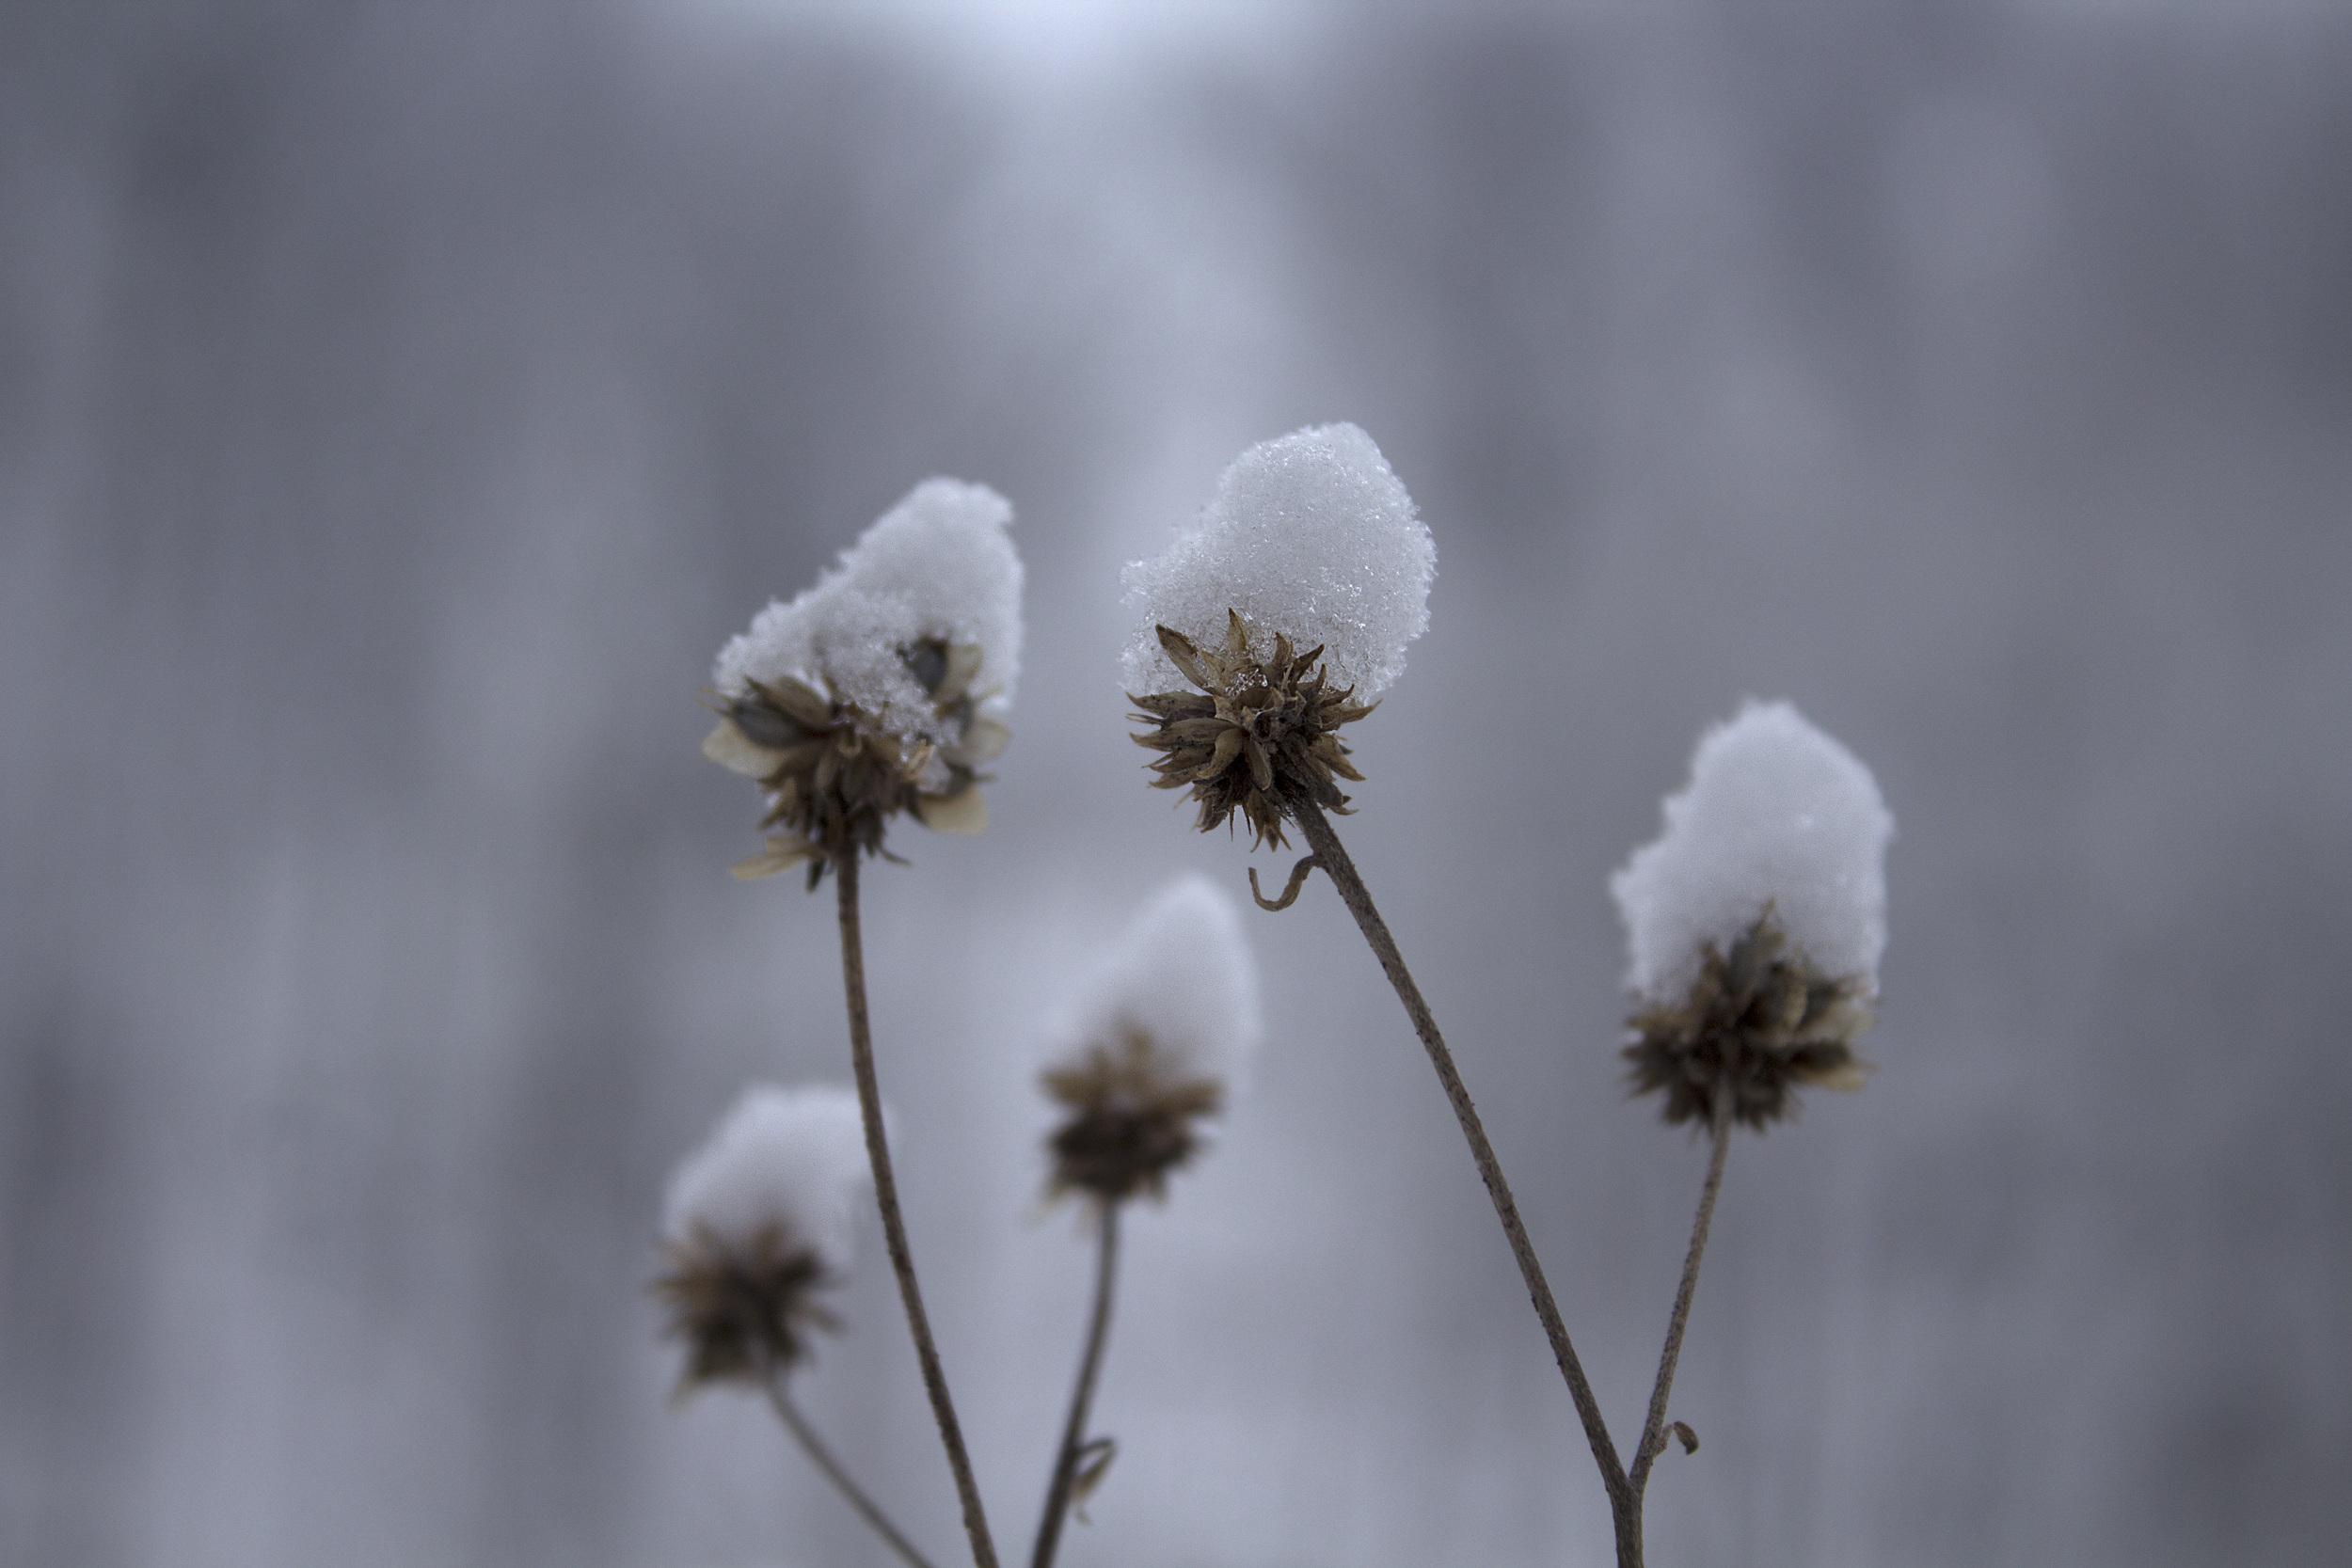 maliqi_woods_snowcap_close up.jpg